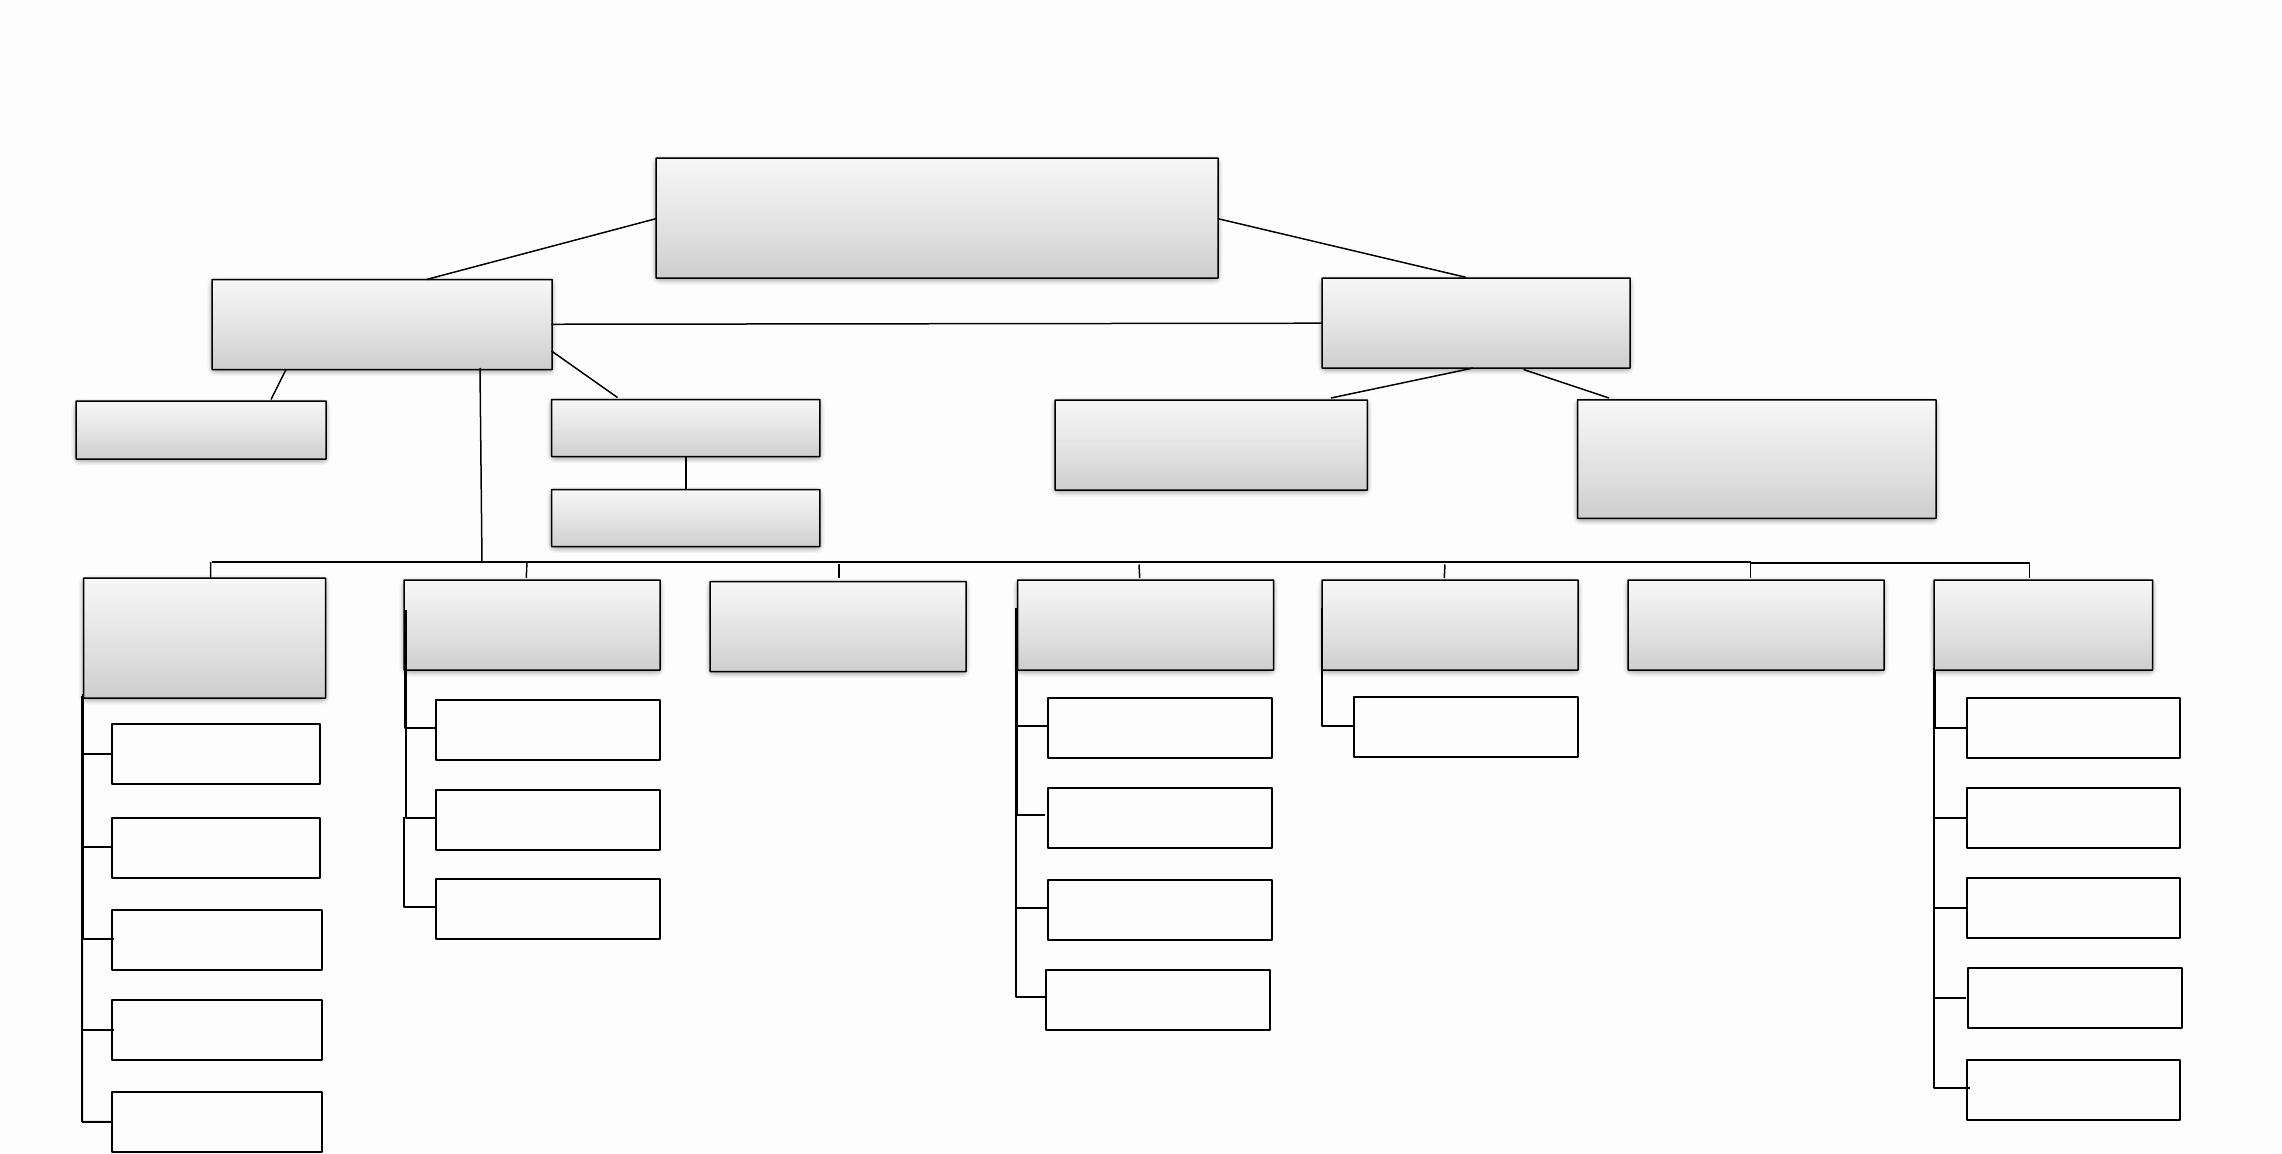 Church organizational Chart Template New Download Central Union Church organizational Chart for